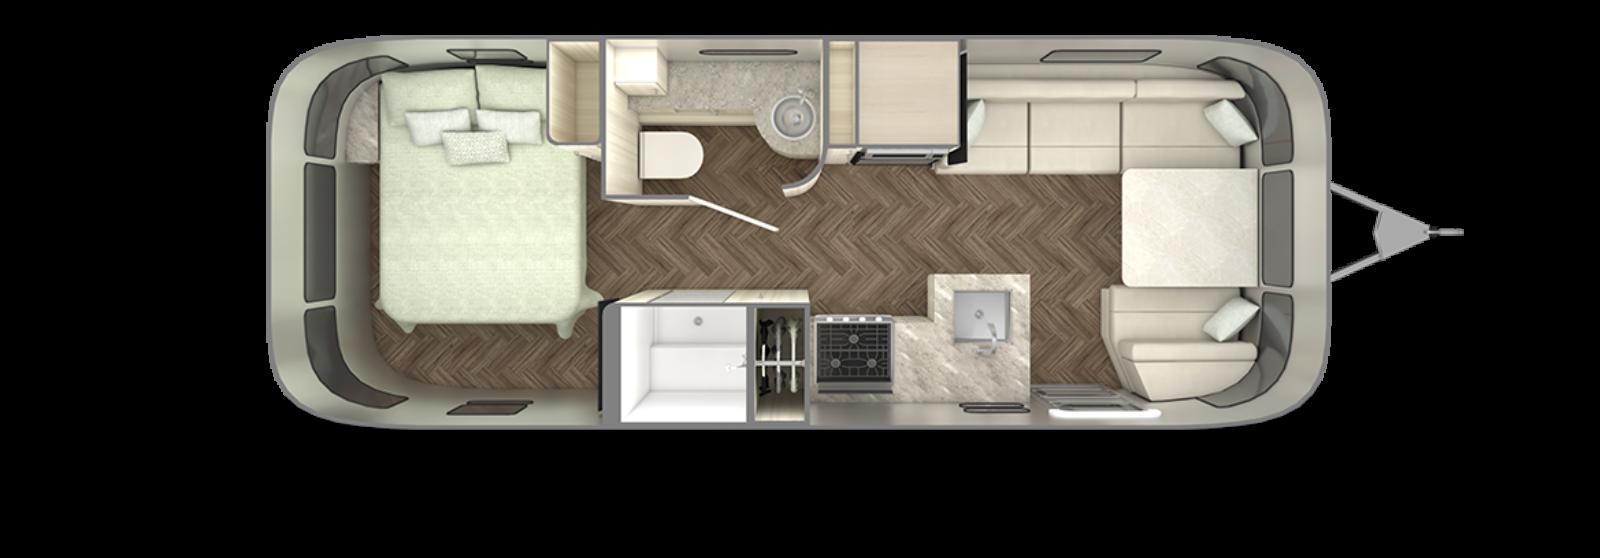 2021-Airstream-International-25RB-floor-plan-seashell